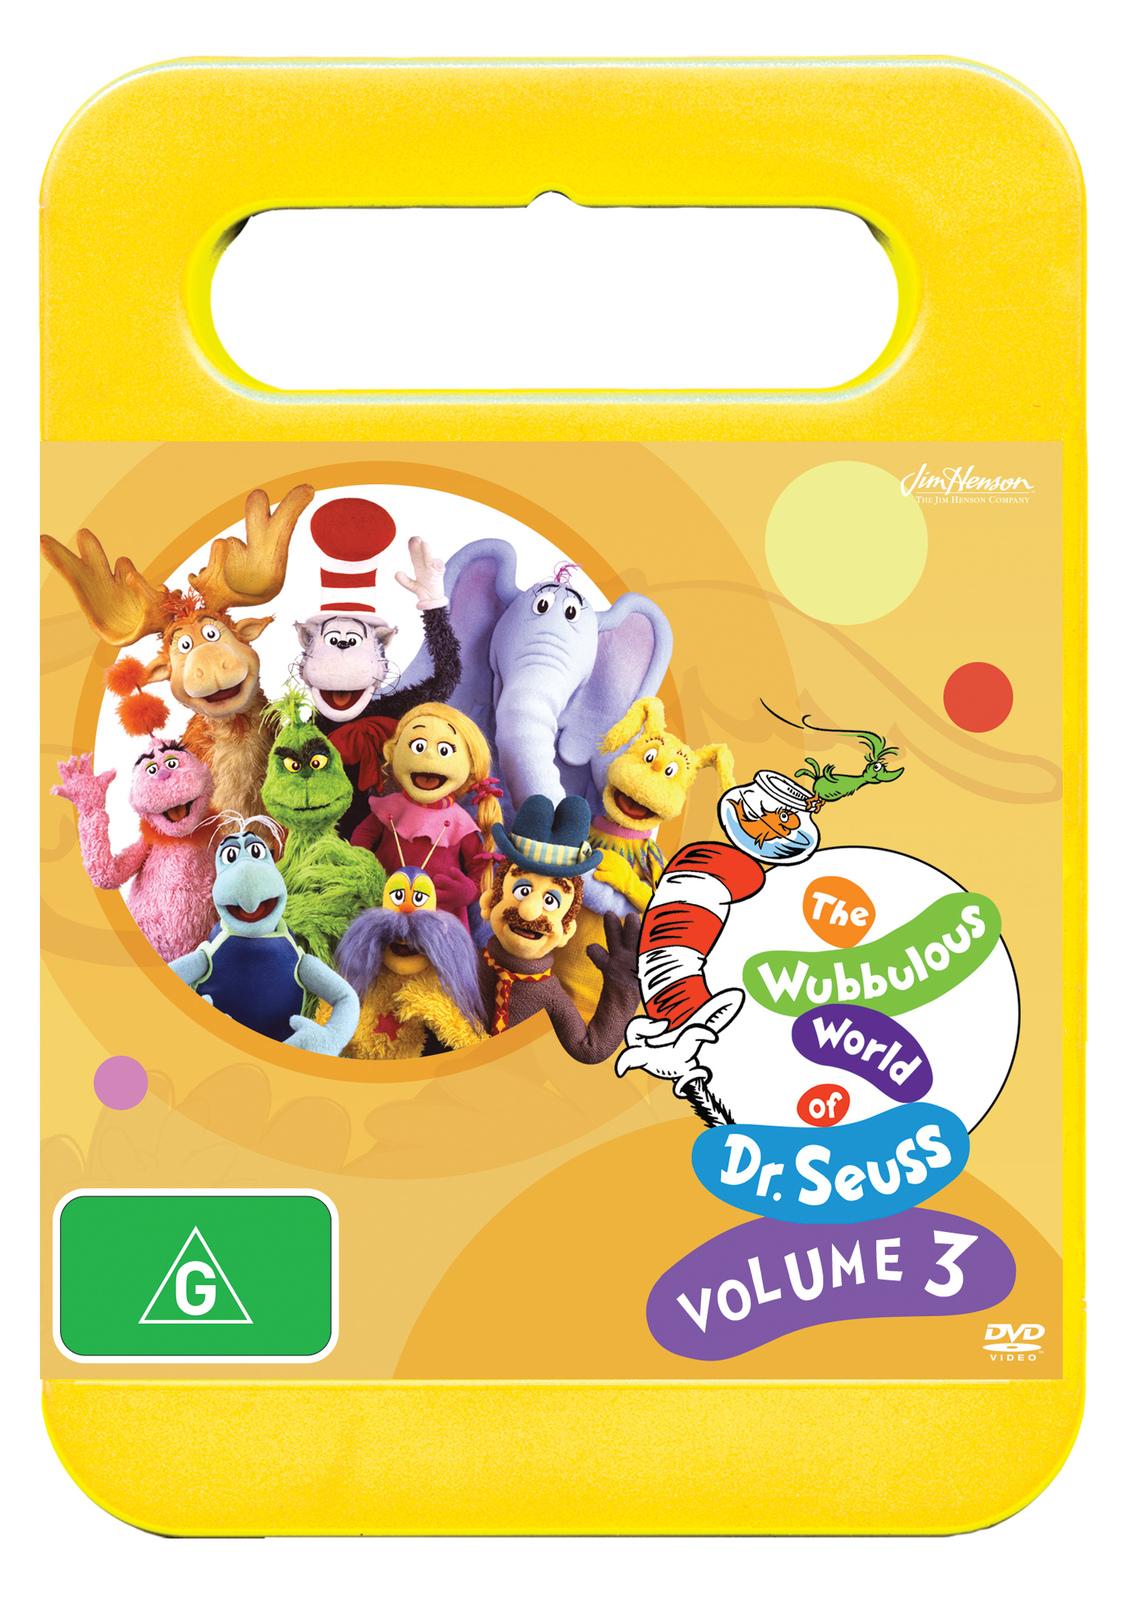 The Wubbulous World of Dr. Seuss - Volume 3 on DVD image